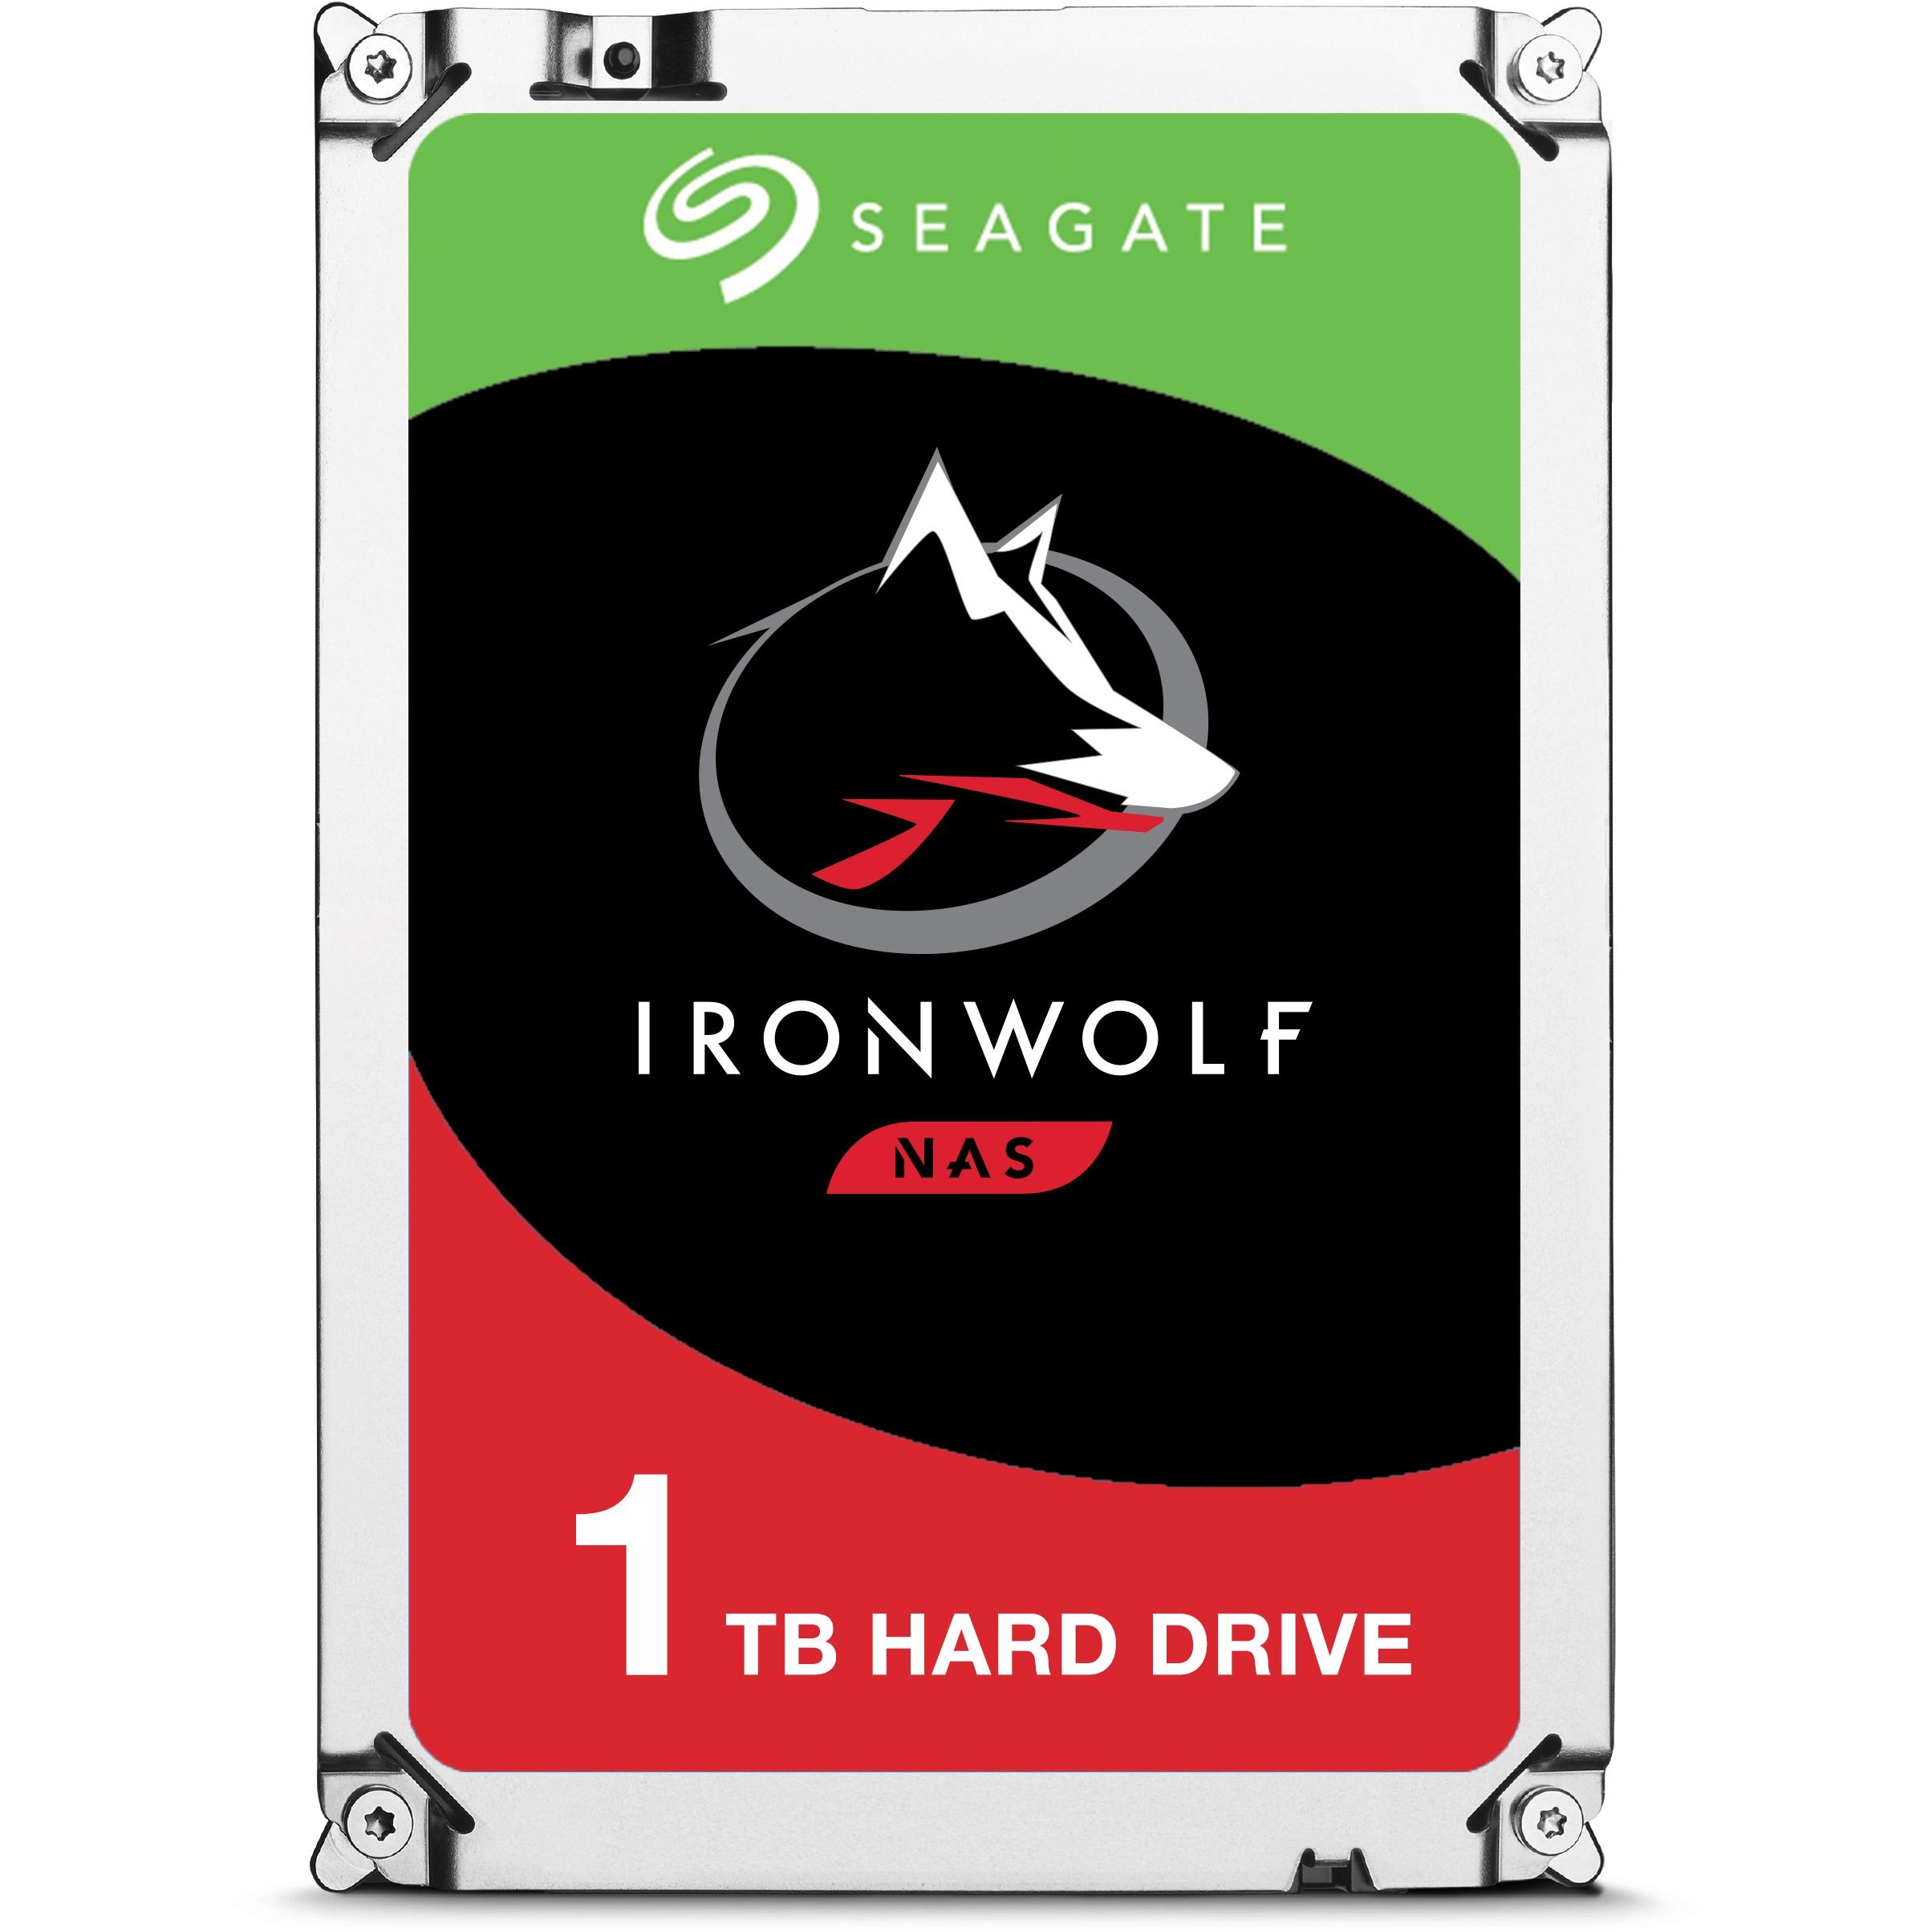 Hard disk seagate ironwolf 3.5  sata3 1tb  nas 64mb